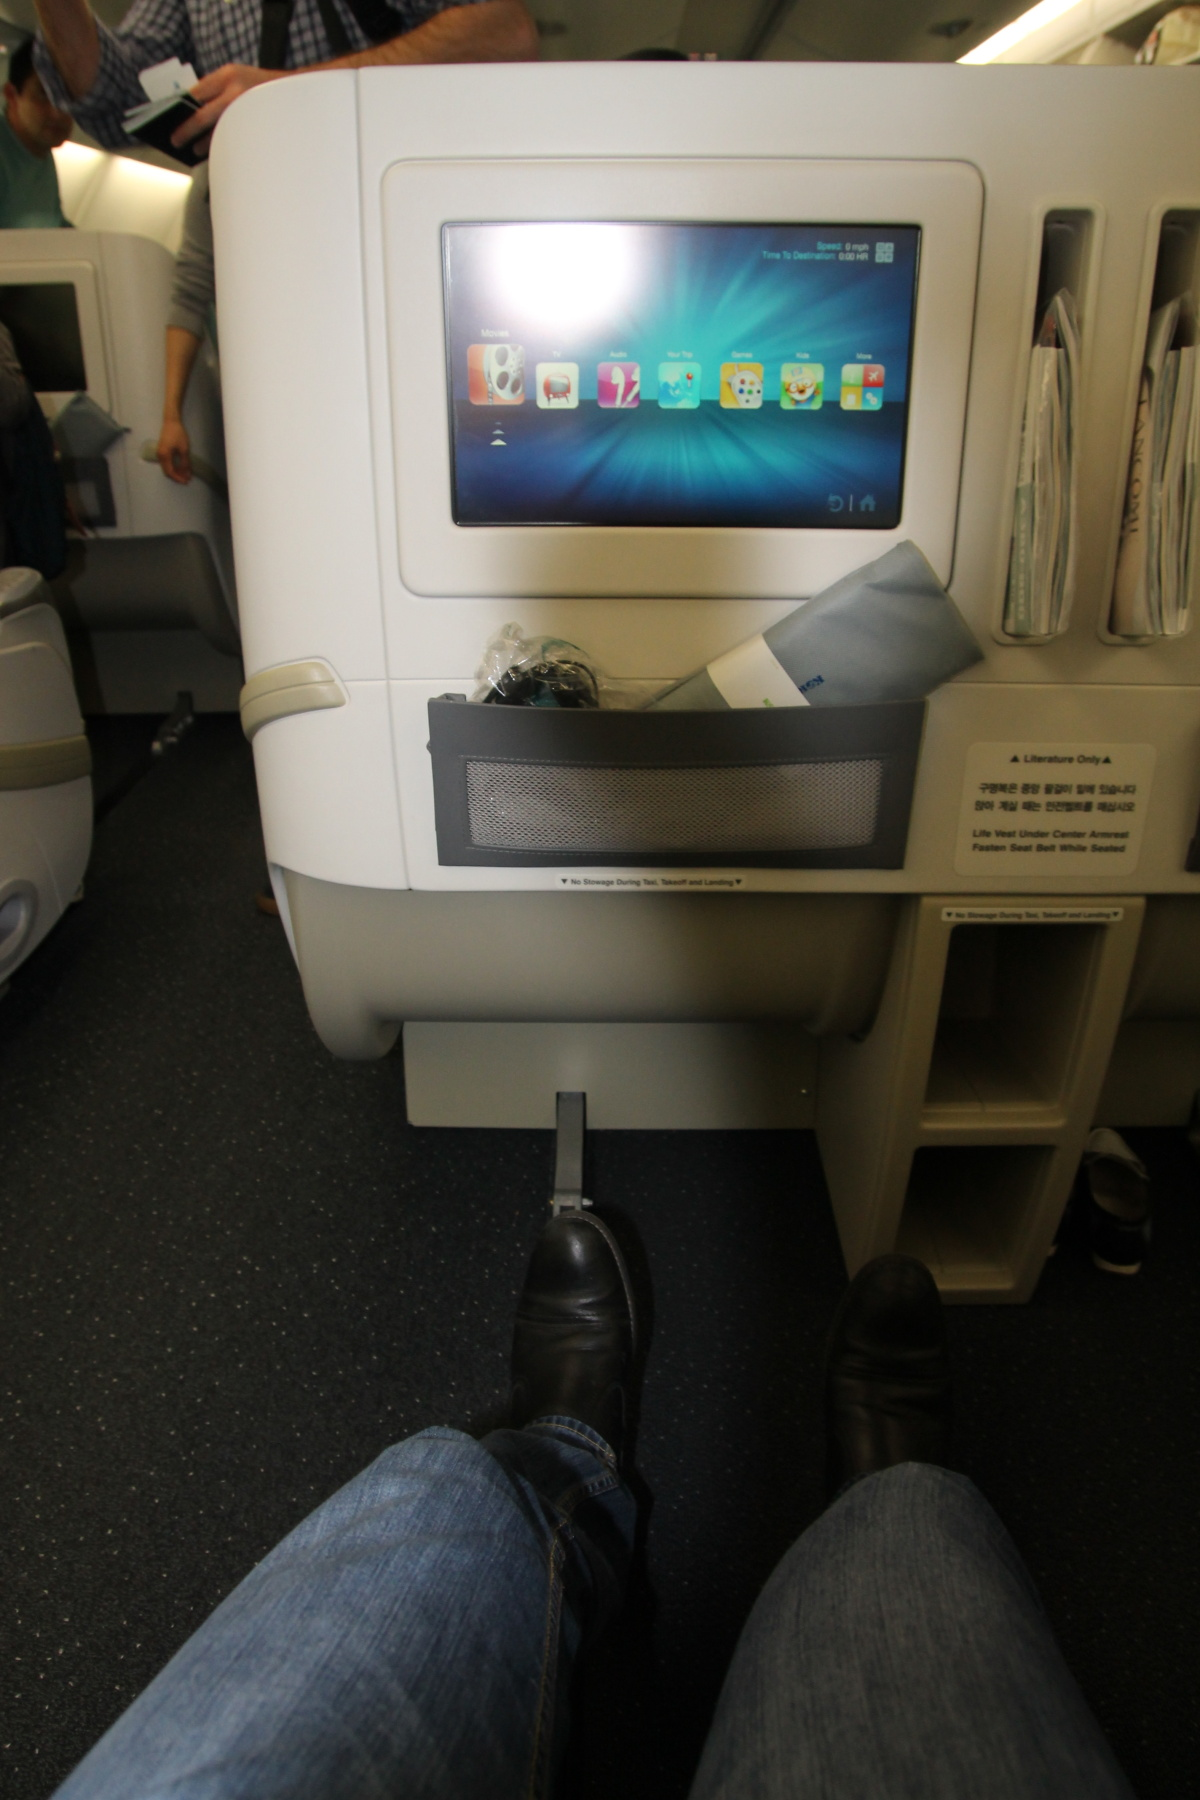 Салон бизнес-класса в самолета Airbus A380 авиакомпании Korean Air